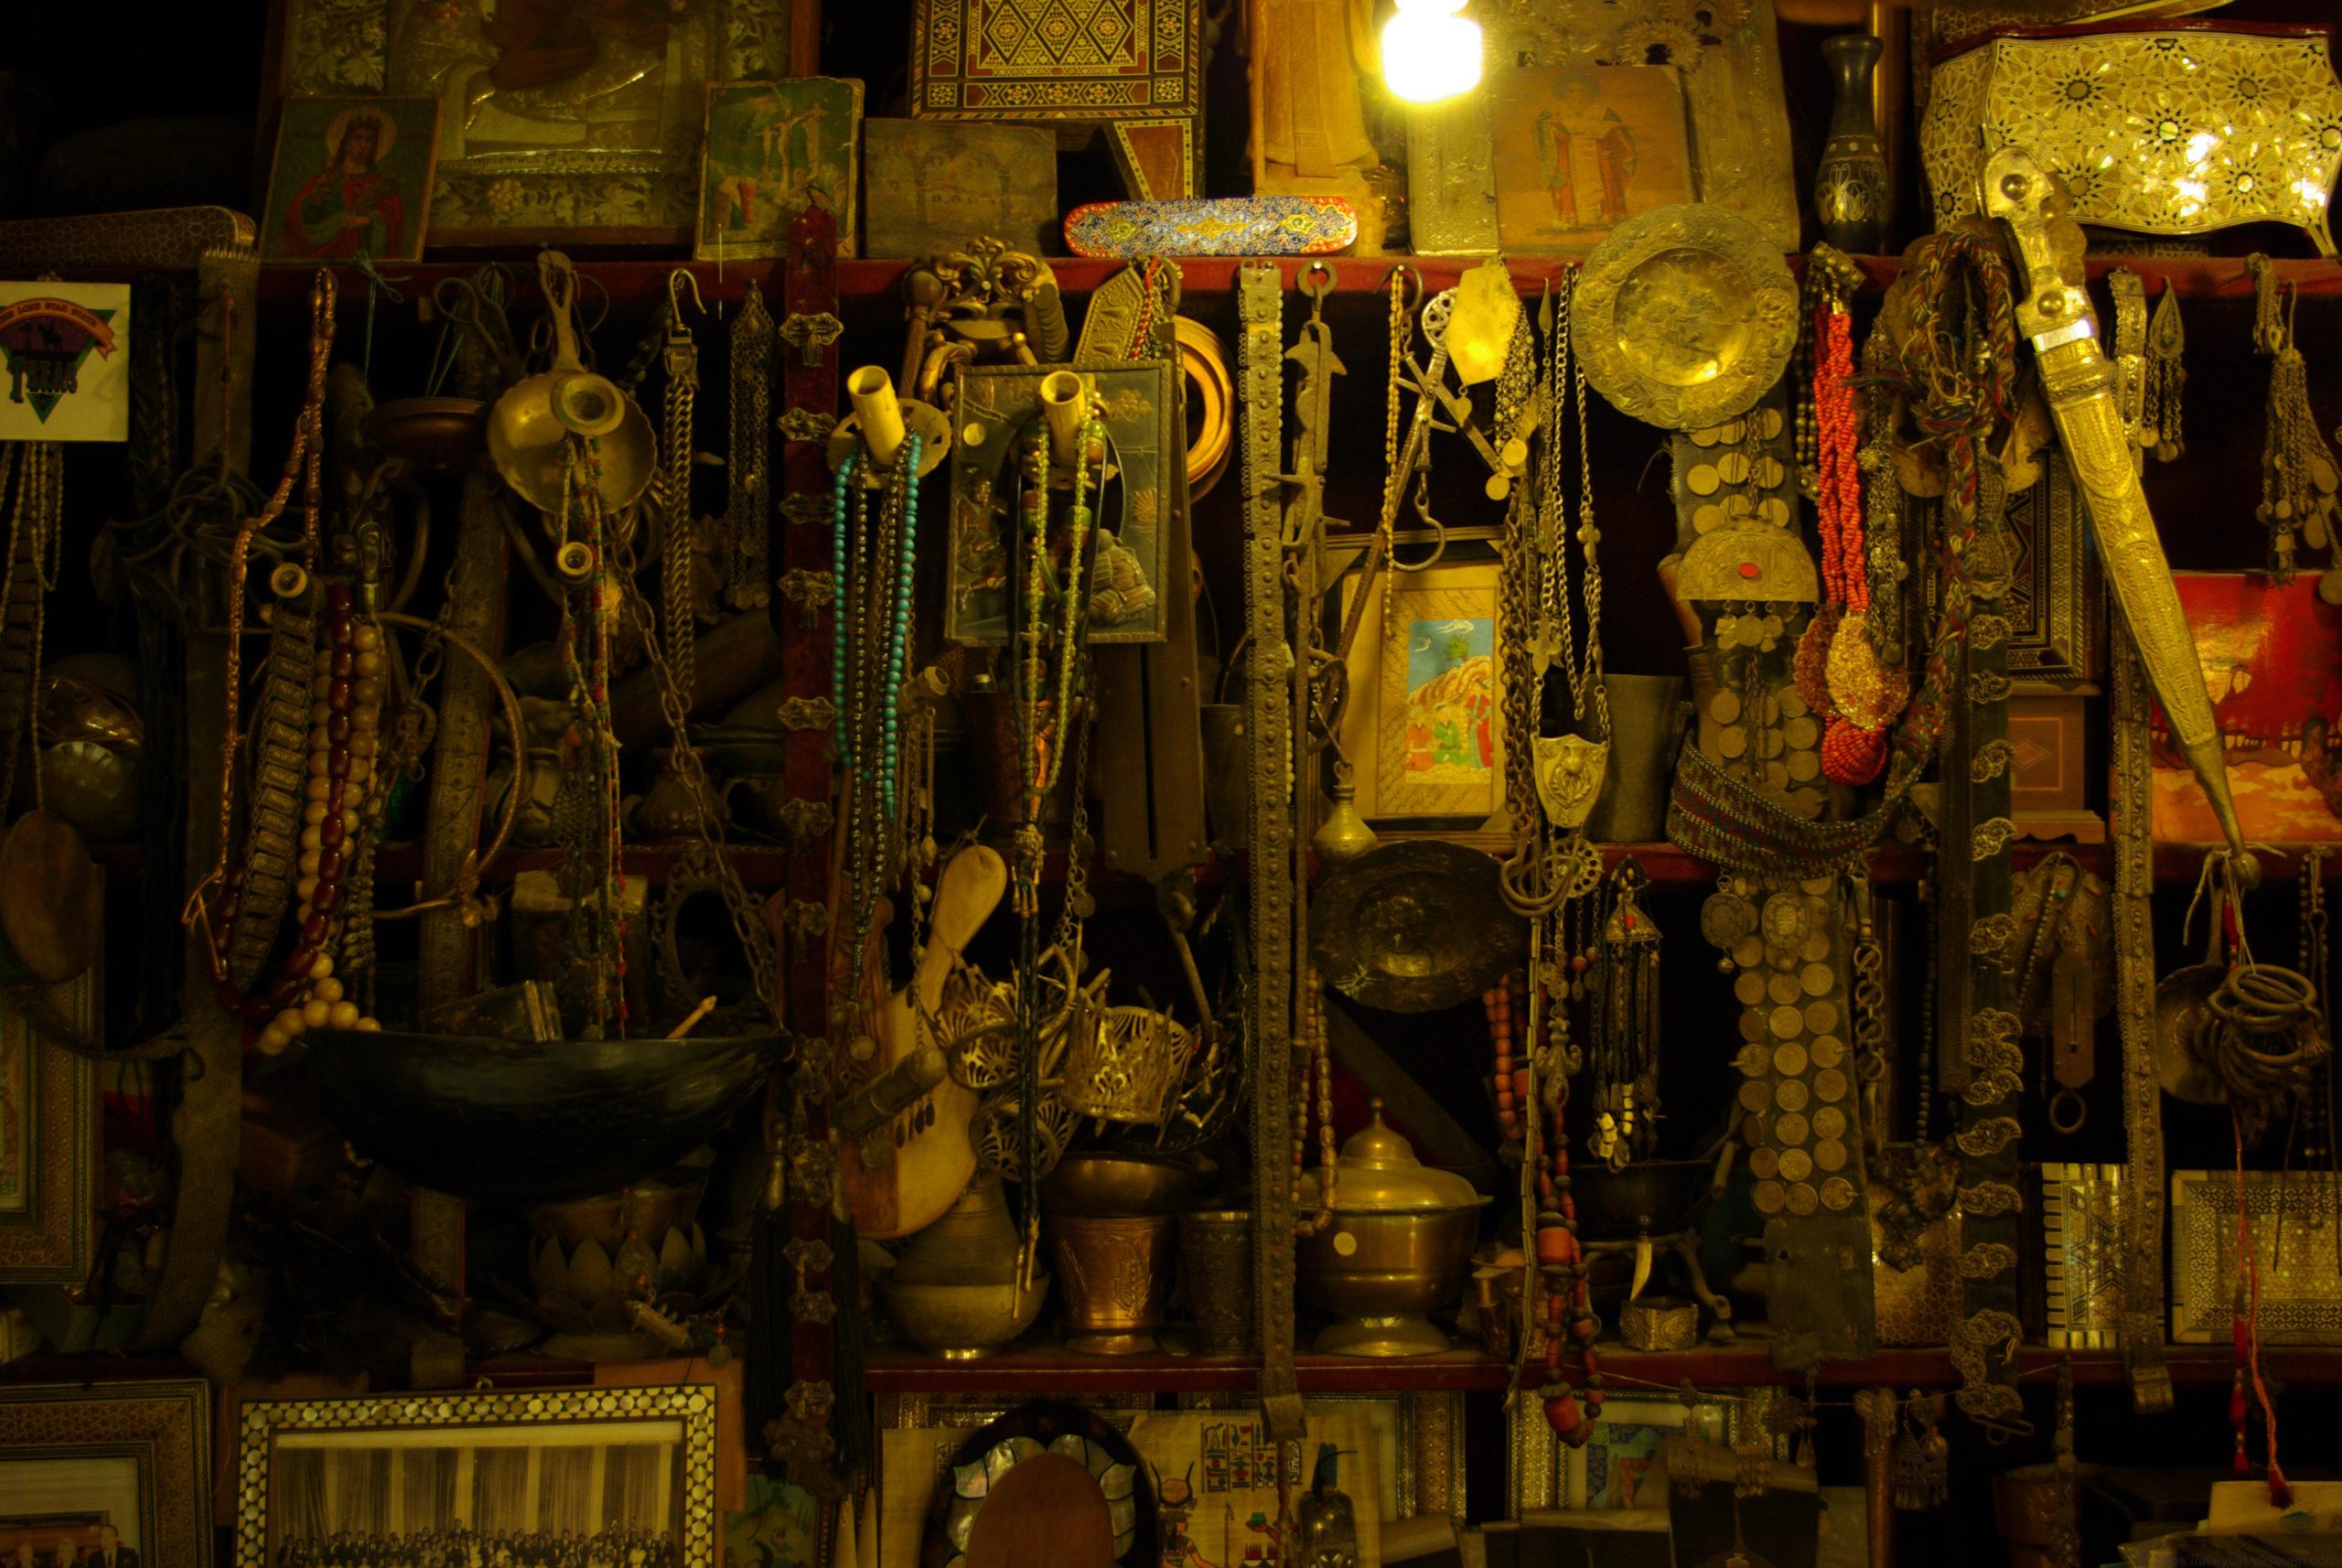 Grand Bazaar, Turkey, 2007